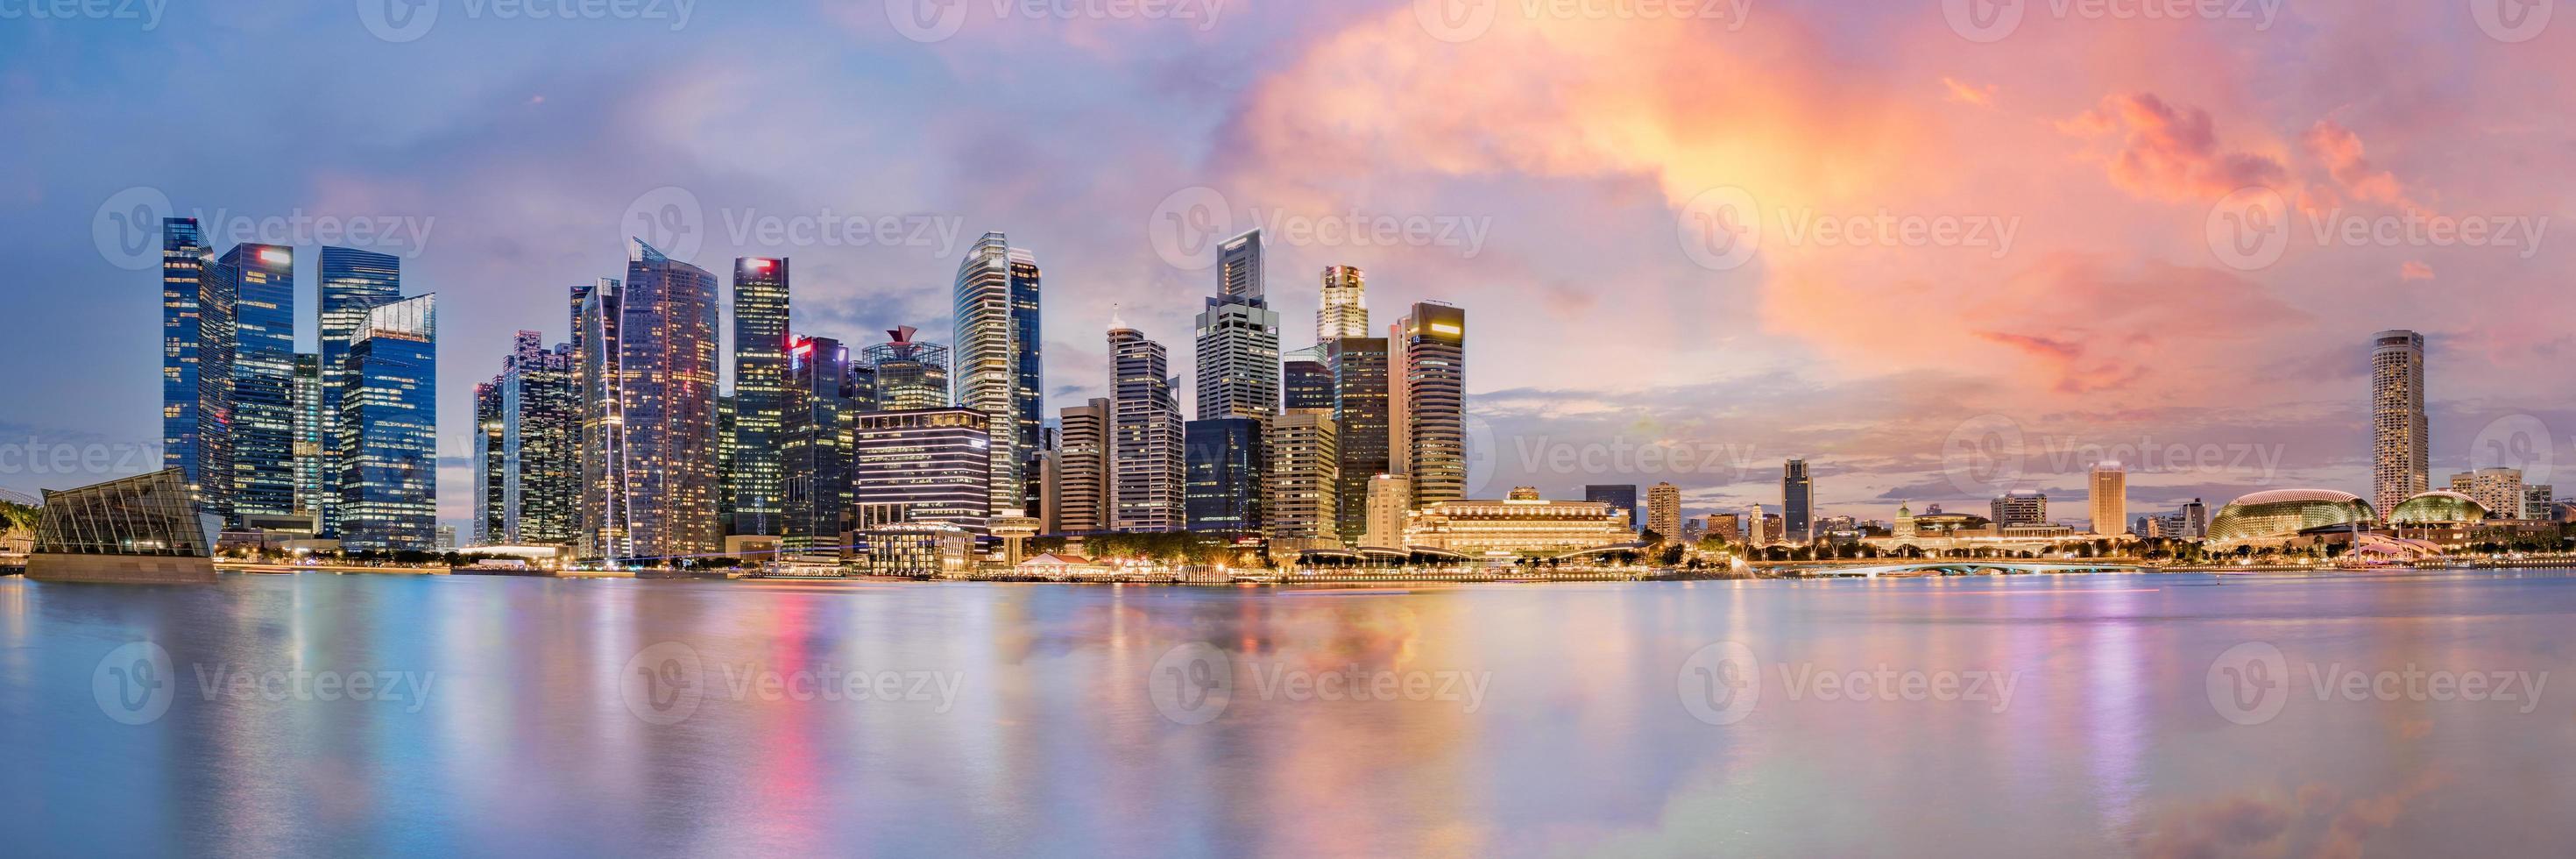 horizonte do distrito financeiro de Singapura na baía da marina no crepúsculo foto